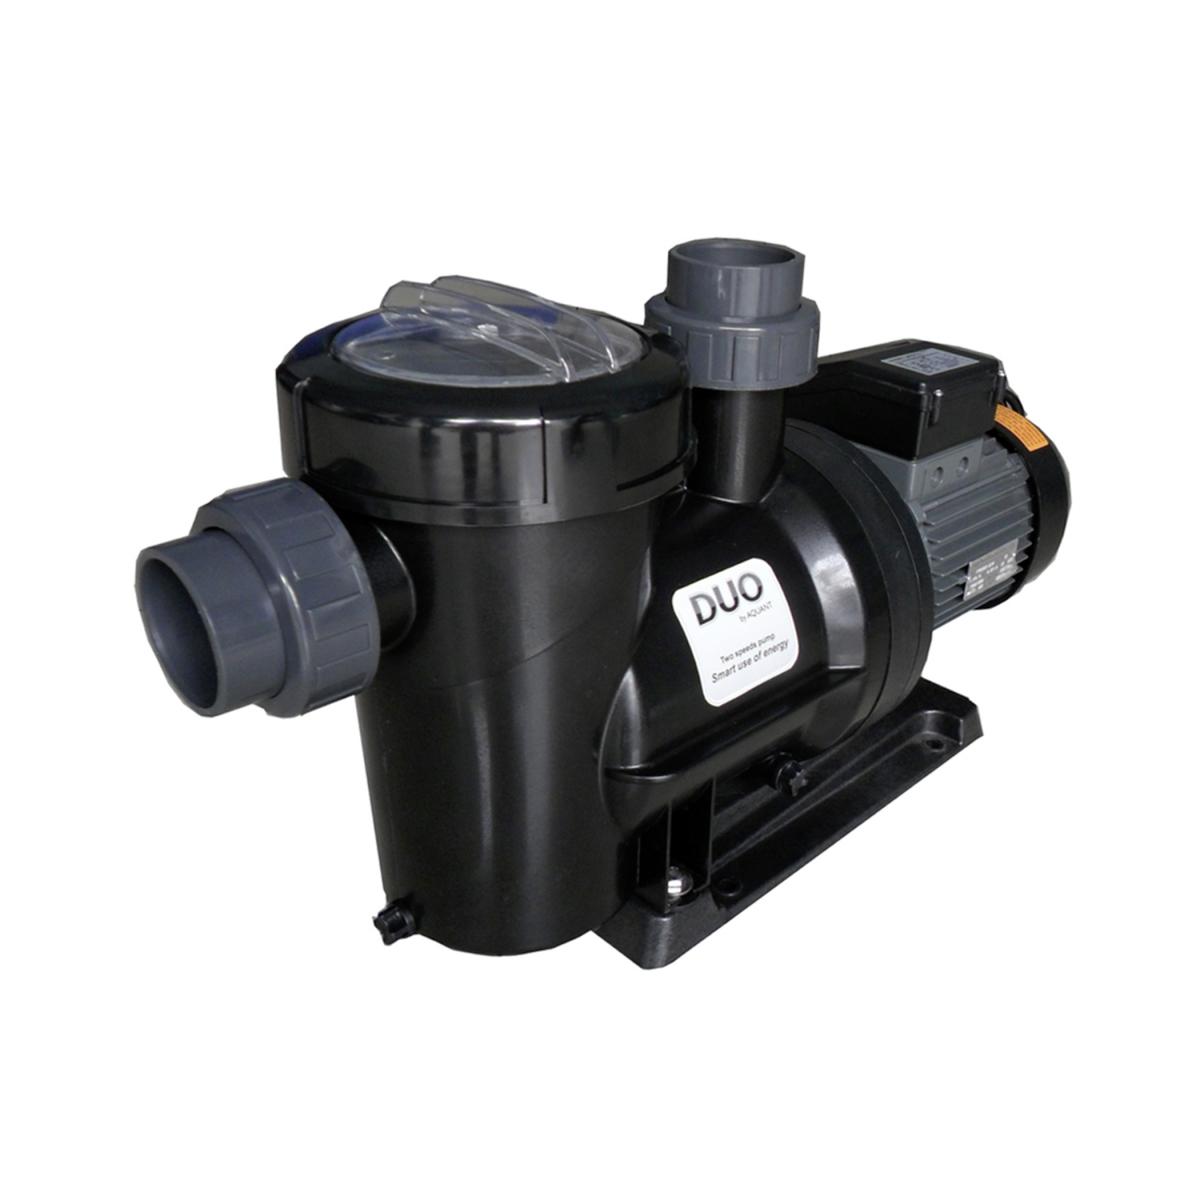 Smart Filterpumpe Duospeed, 1 PS, 9 m3/h  Smart Filterpumpe Duospeed, 1 PS, 9 m3/h